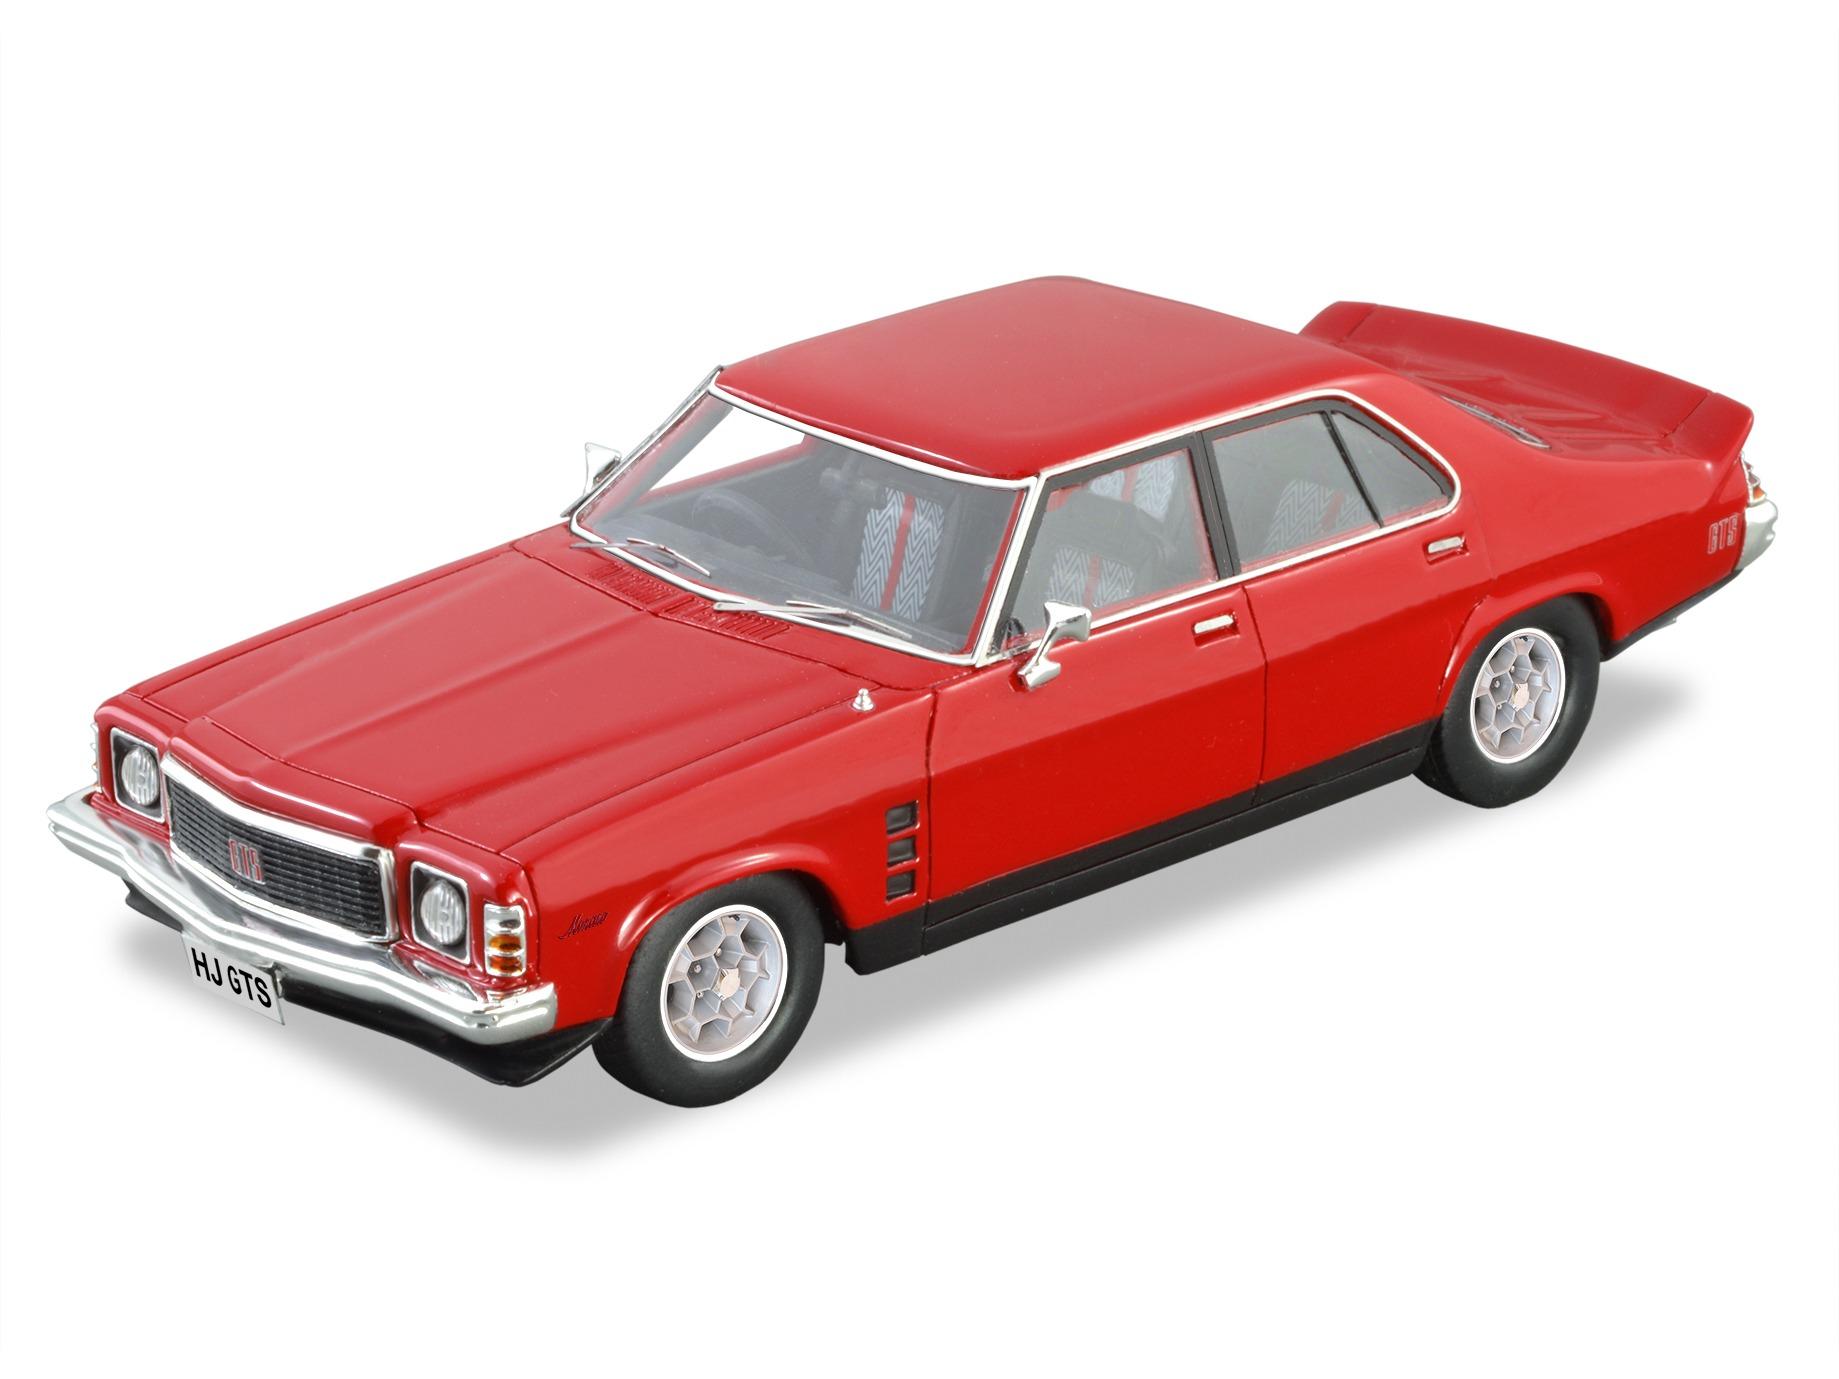 1975 Holden HJ Monaro GTS Sedan – Red